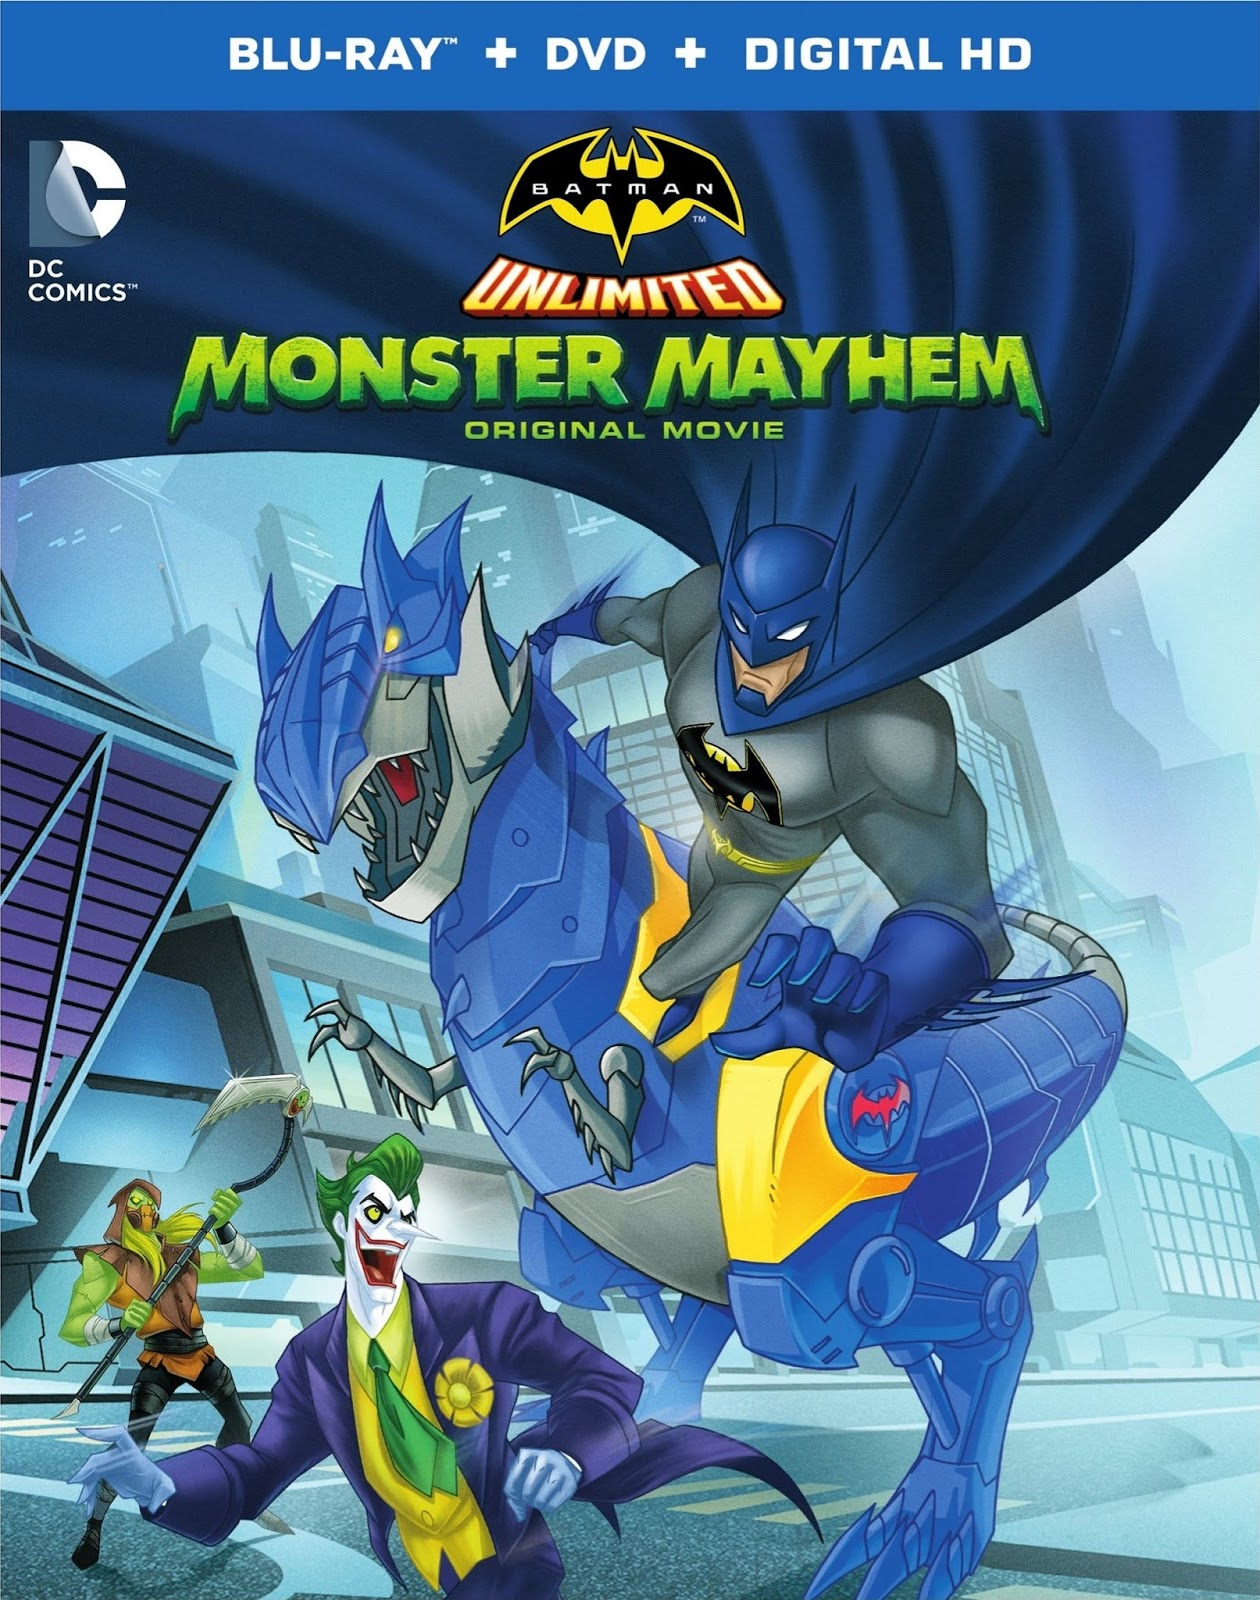 Quái Vật Nổi Loạn Lồng tiếng - Batman Unlimited: Monster Mayhem